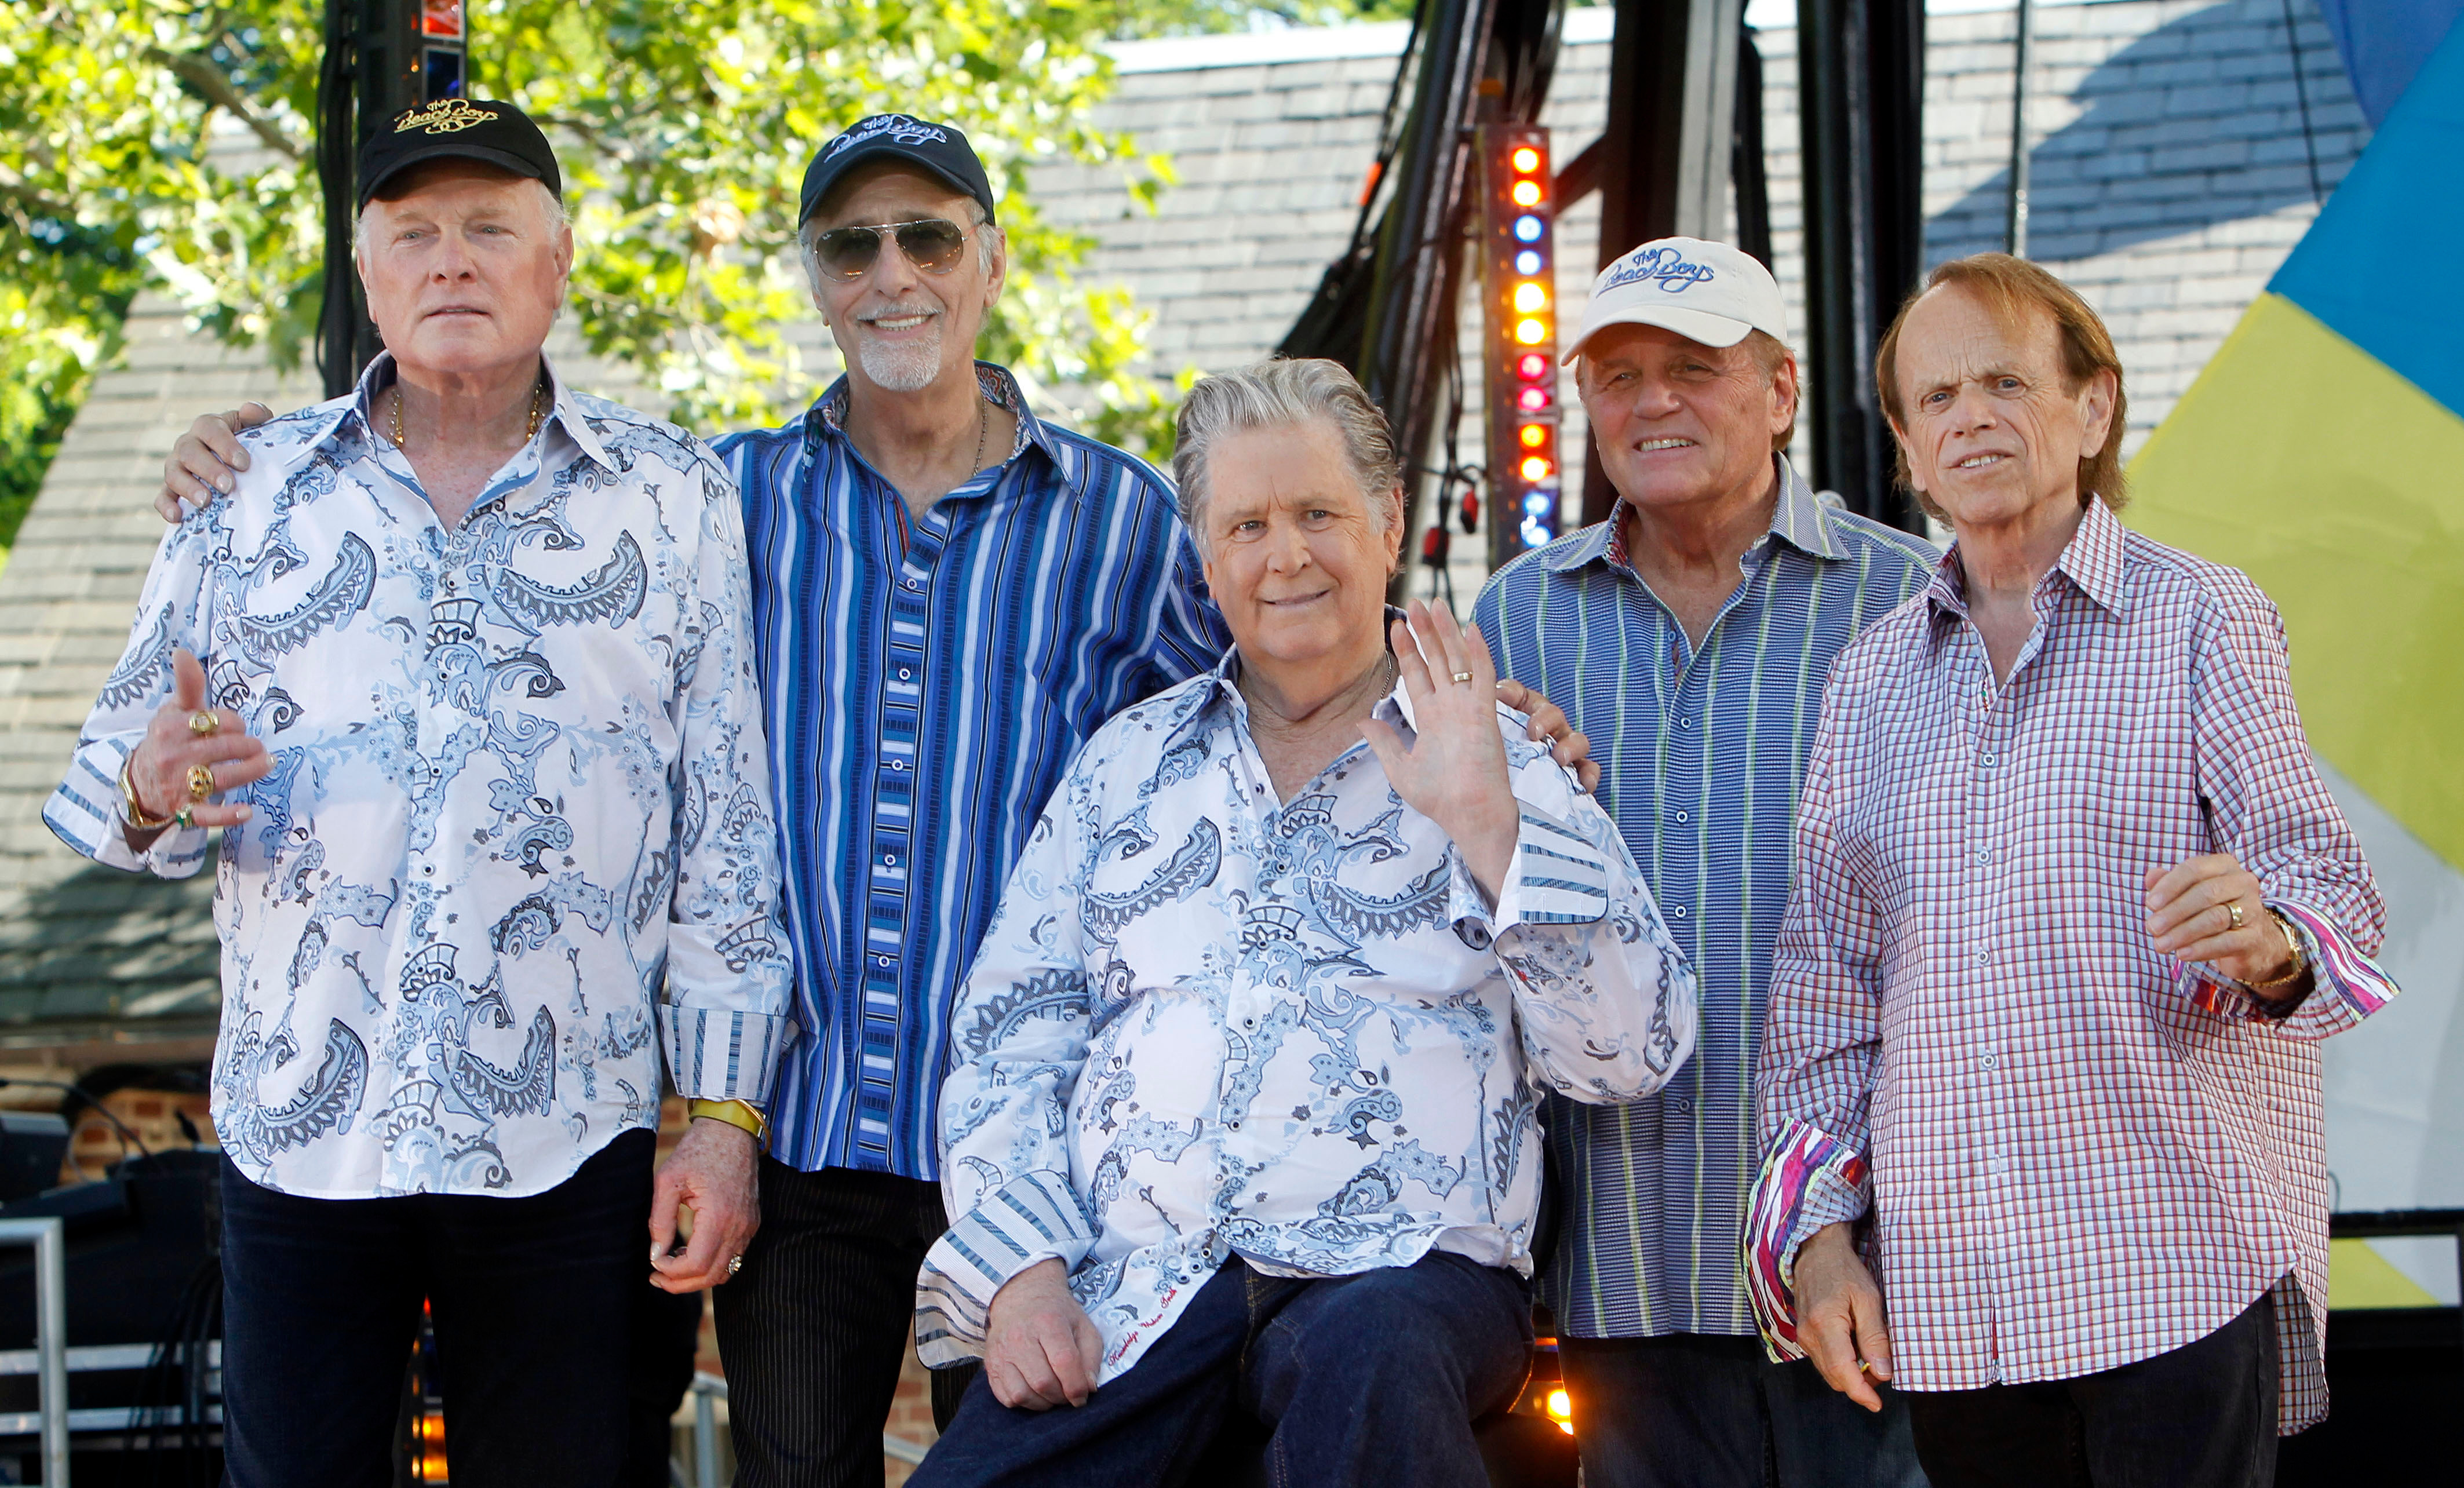 The Beach Boys at the Amphitheater